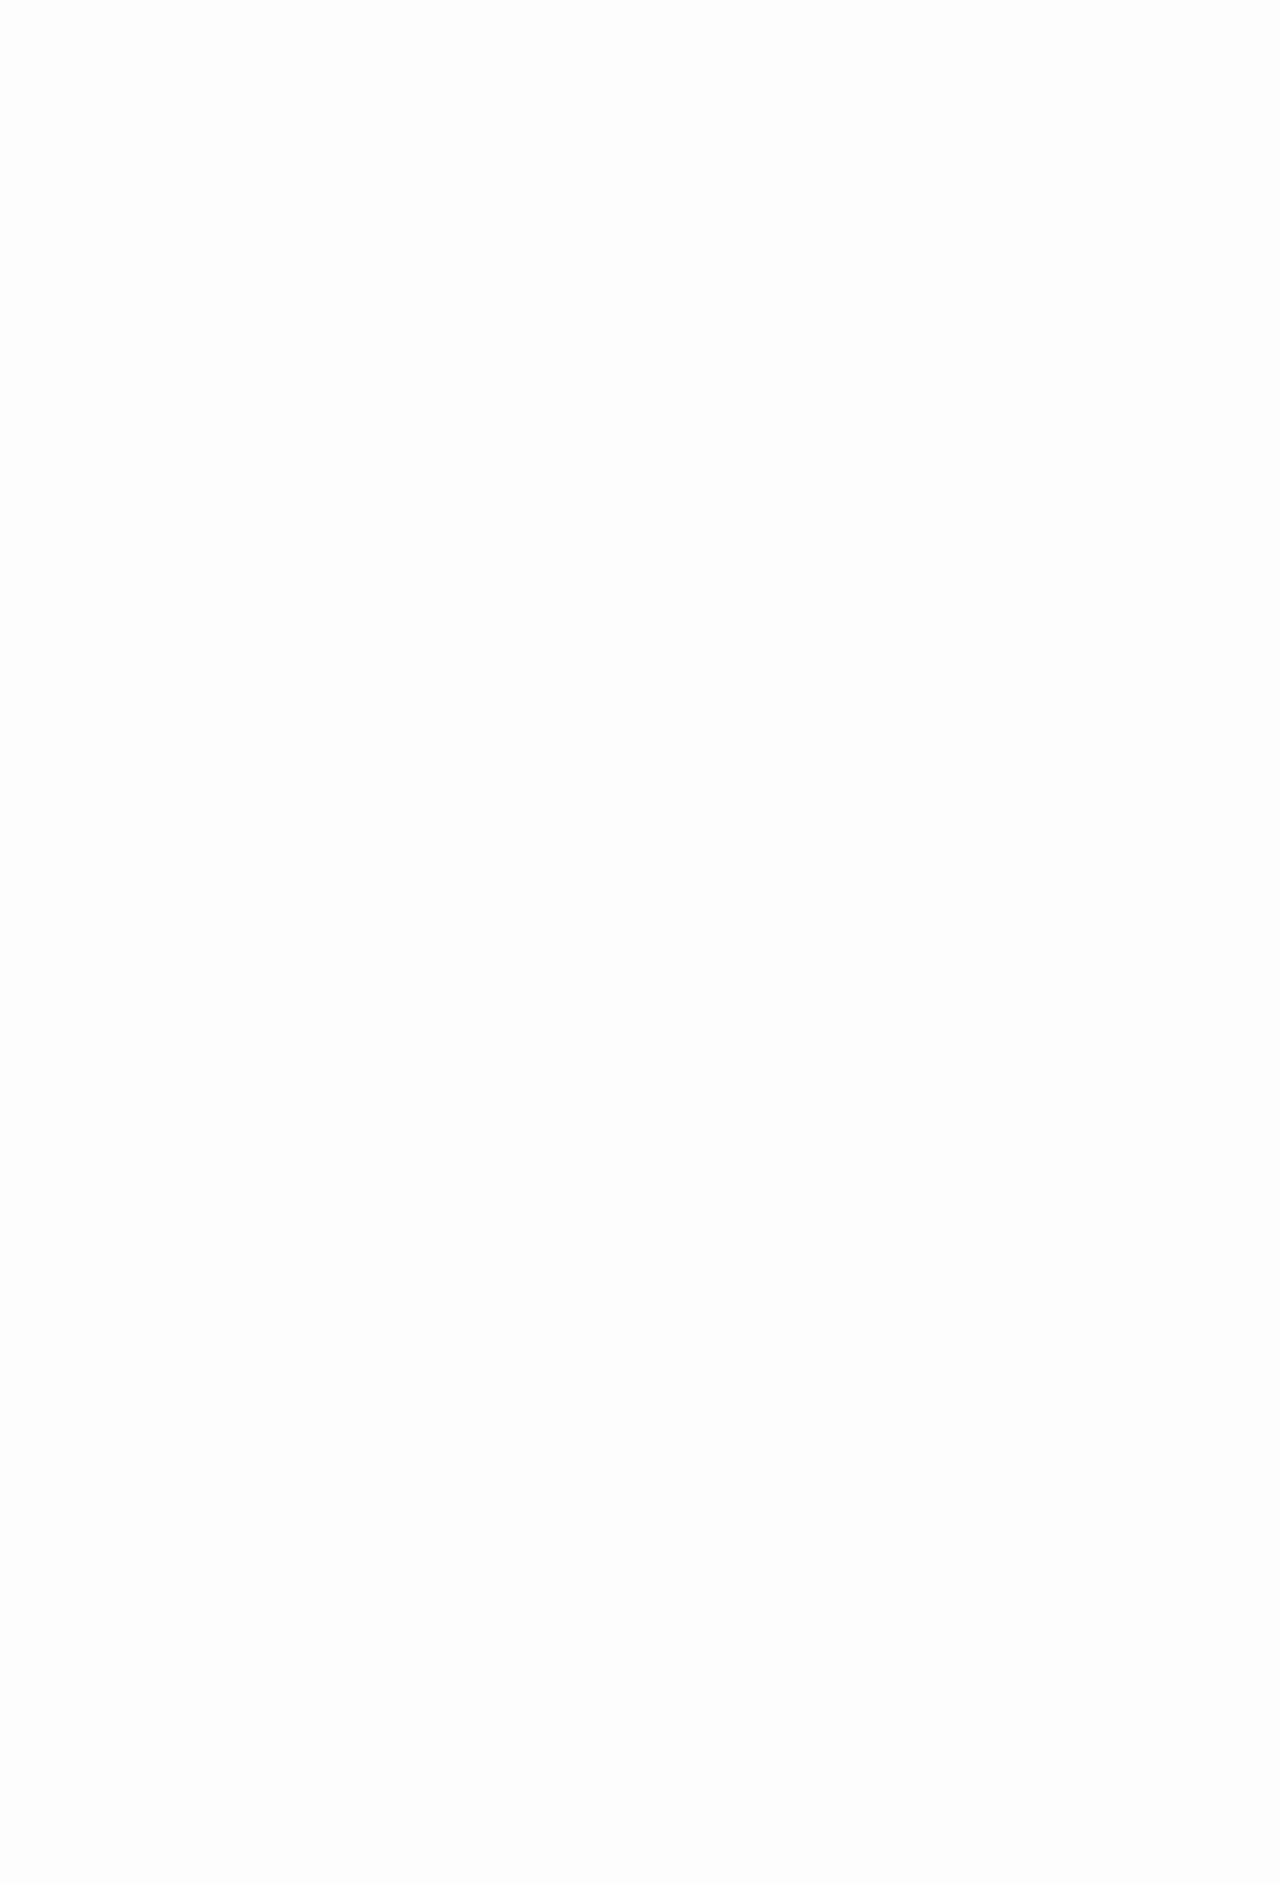 (C90) [The Dungeon in Yarn (Yone Kinji)] Mahou Shoujo wa Mahou Tsukai (30-sai Doutei) o Taosu no ga Oshigoto desu | It's a Magical Girl's Duty to Kill Wizards (30y virgins) [English] [Chastity Dreamer Schmö] 1